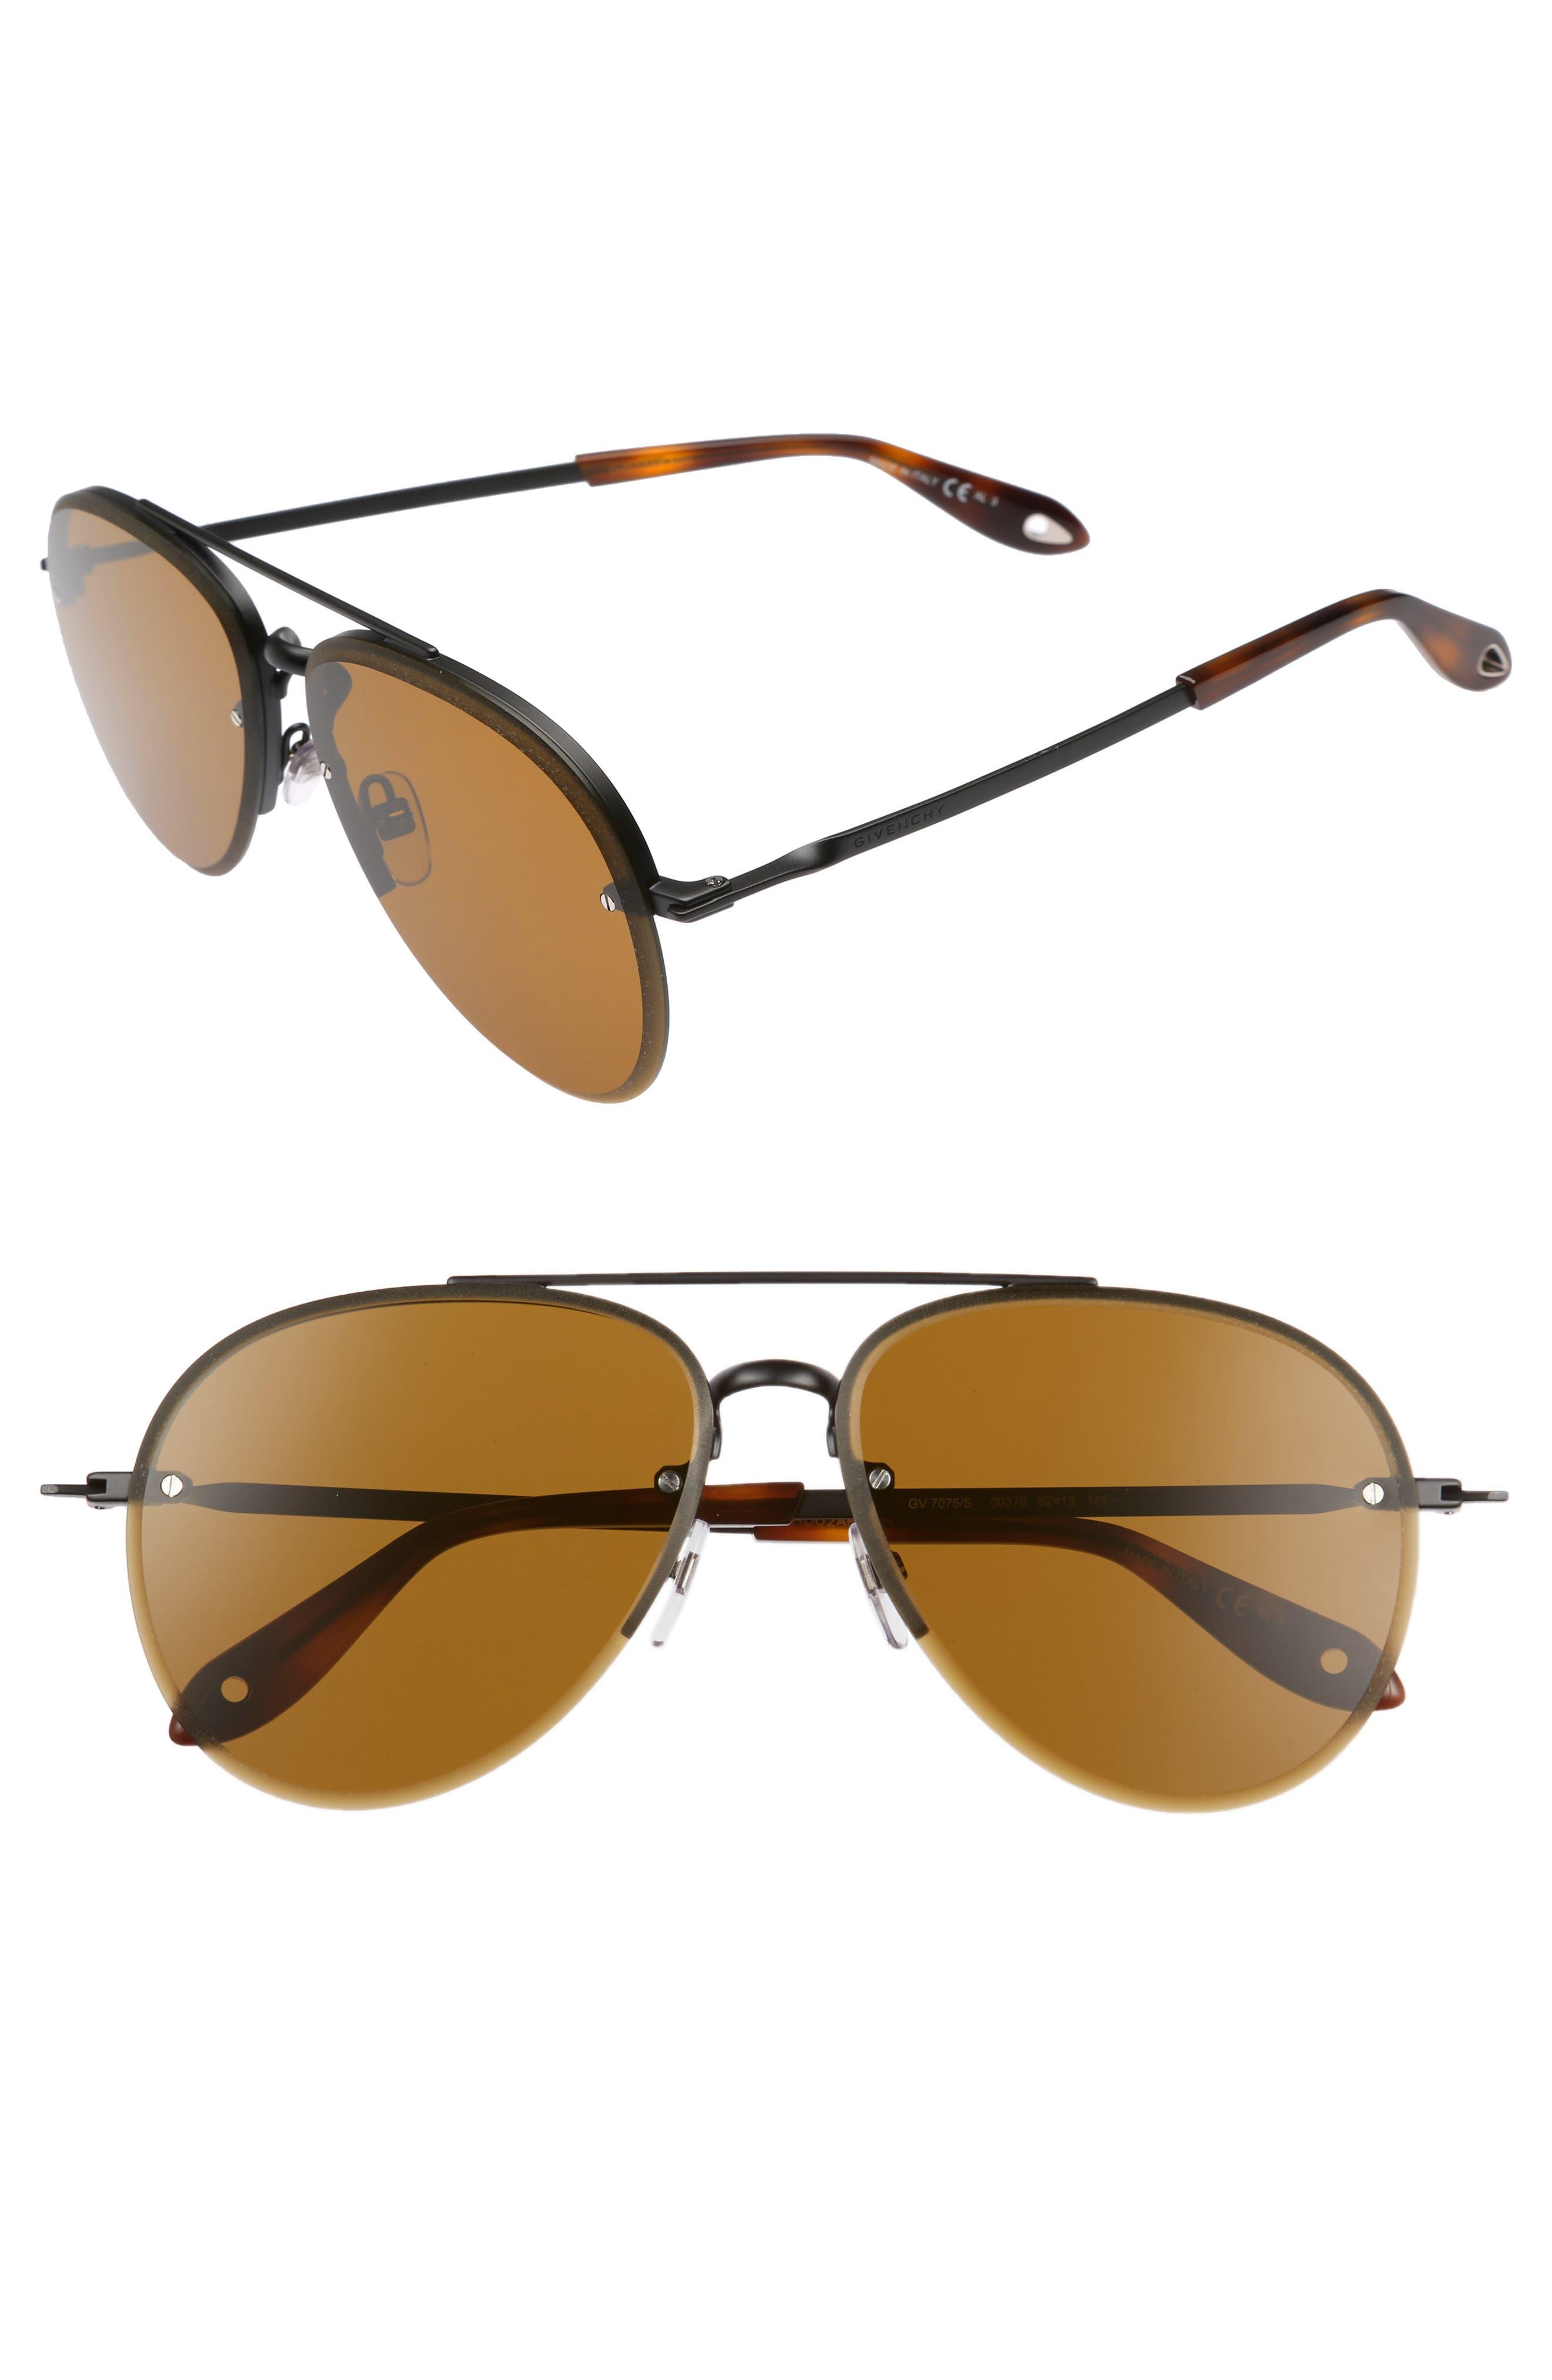 503ebfd21a Givenchy 62Mm Oversize Aviator Sunglasses - Matte Black